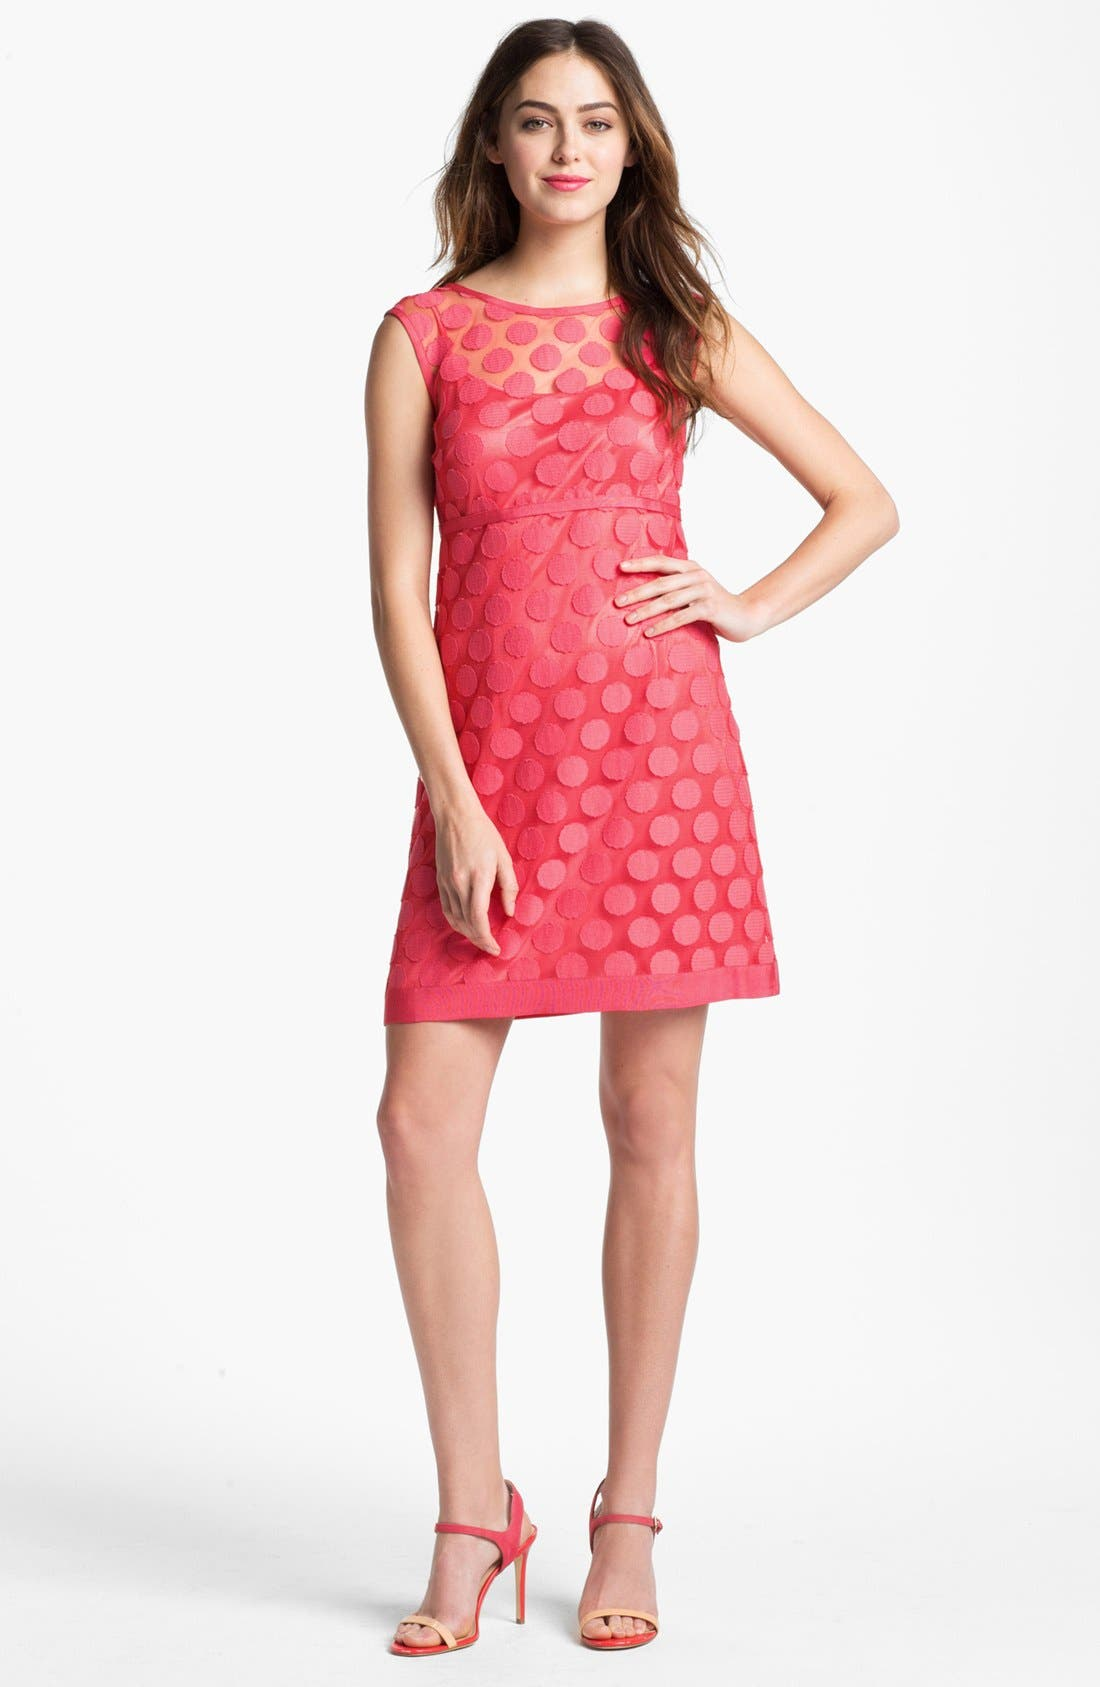 Alternate Image 1  - Laundry by Shelli Segal Polka Dot Lace A-Line Dress (Regular & Petite)